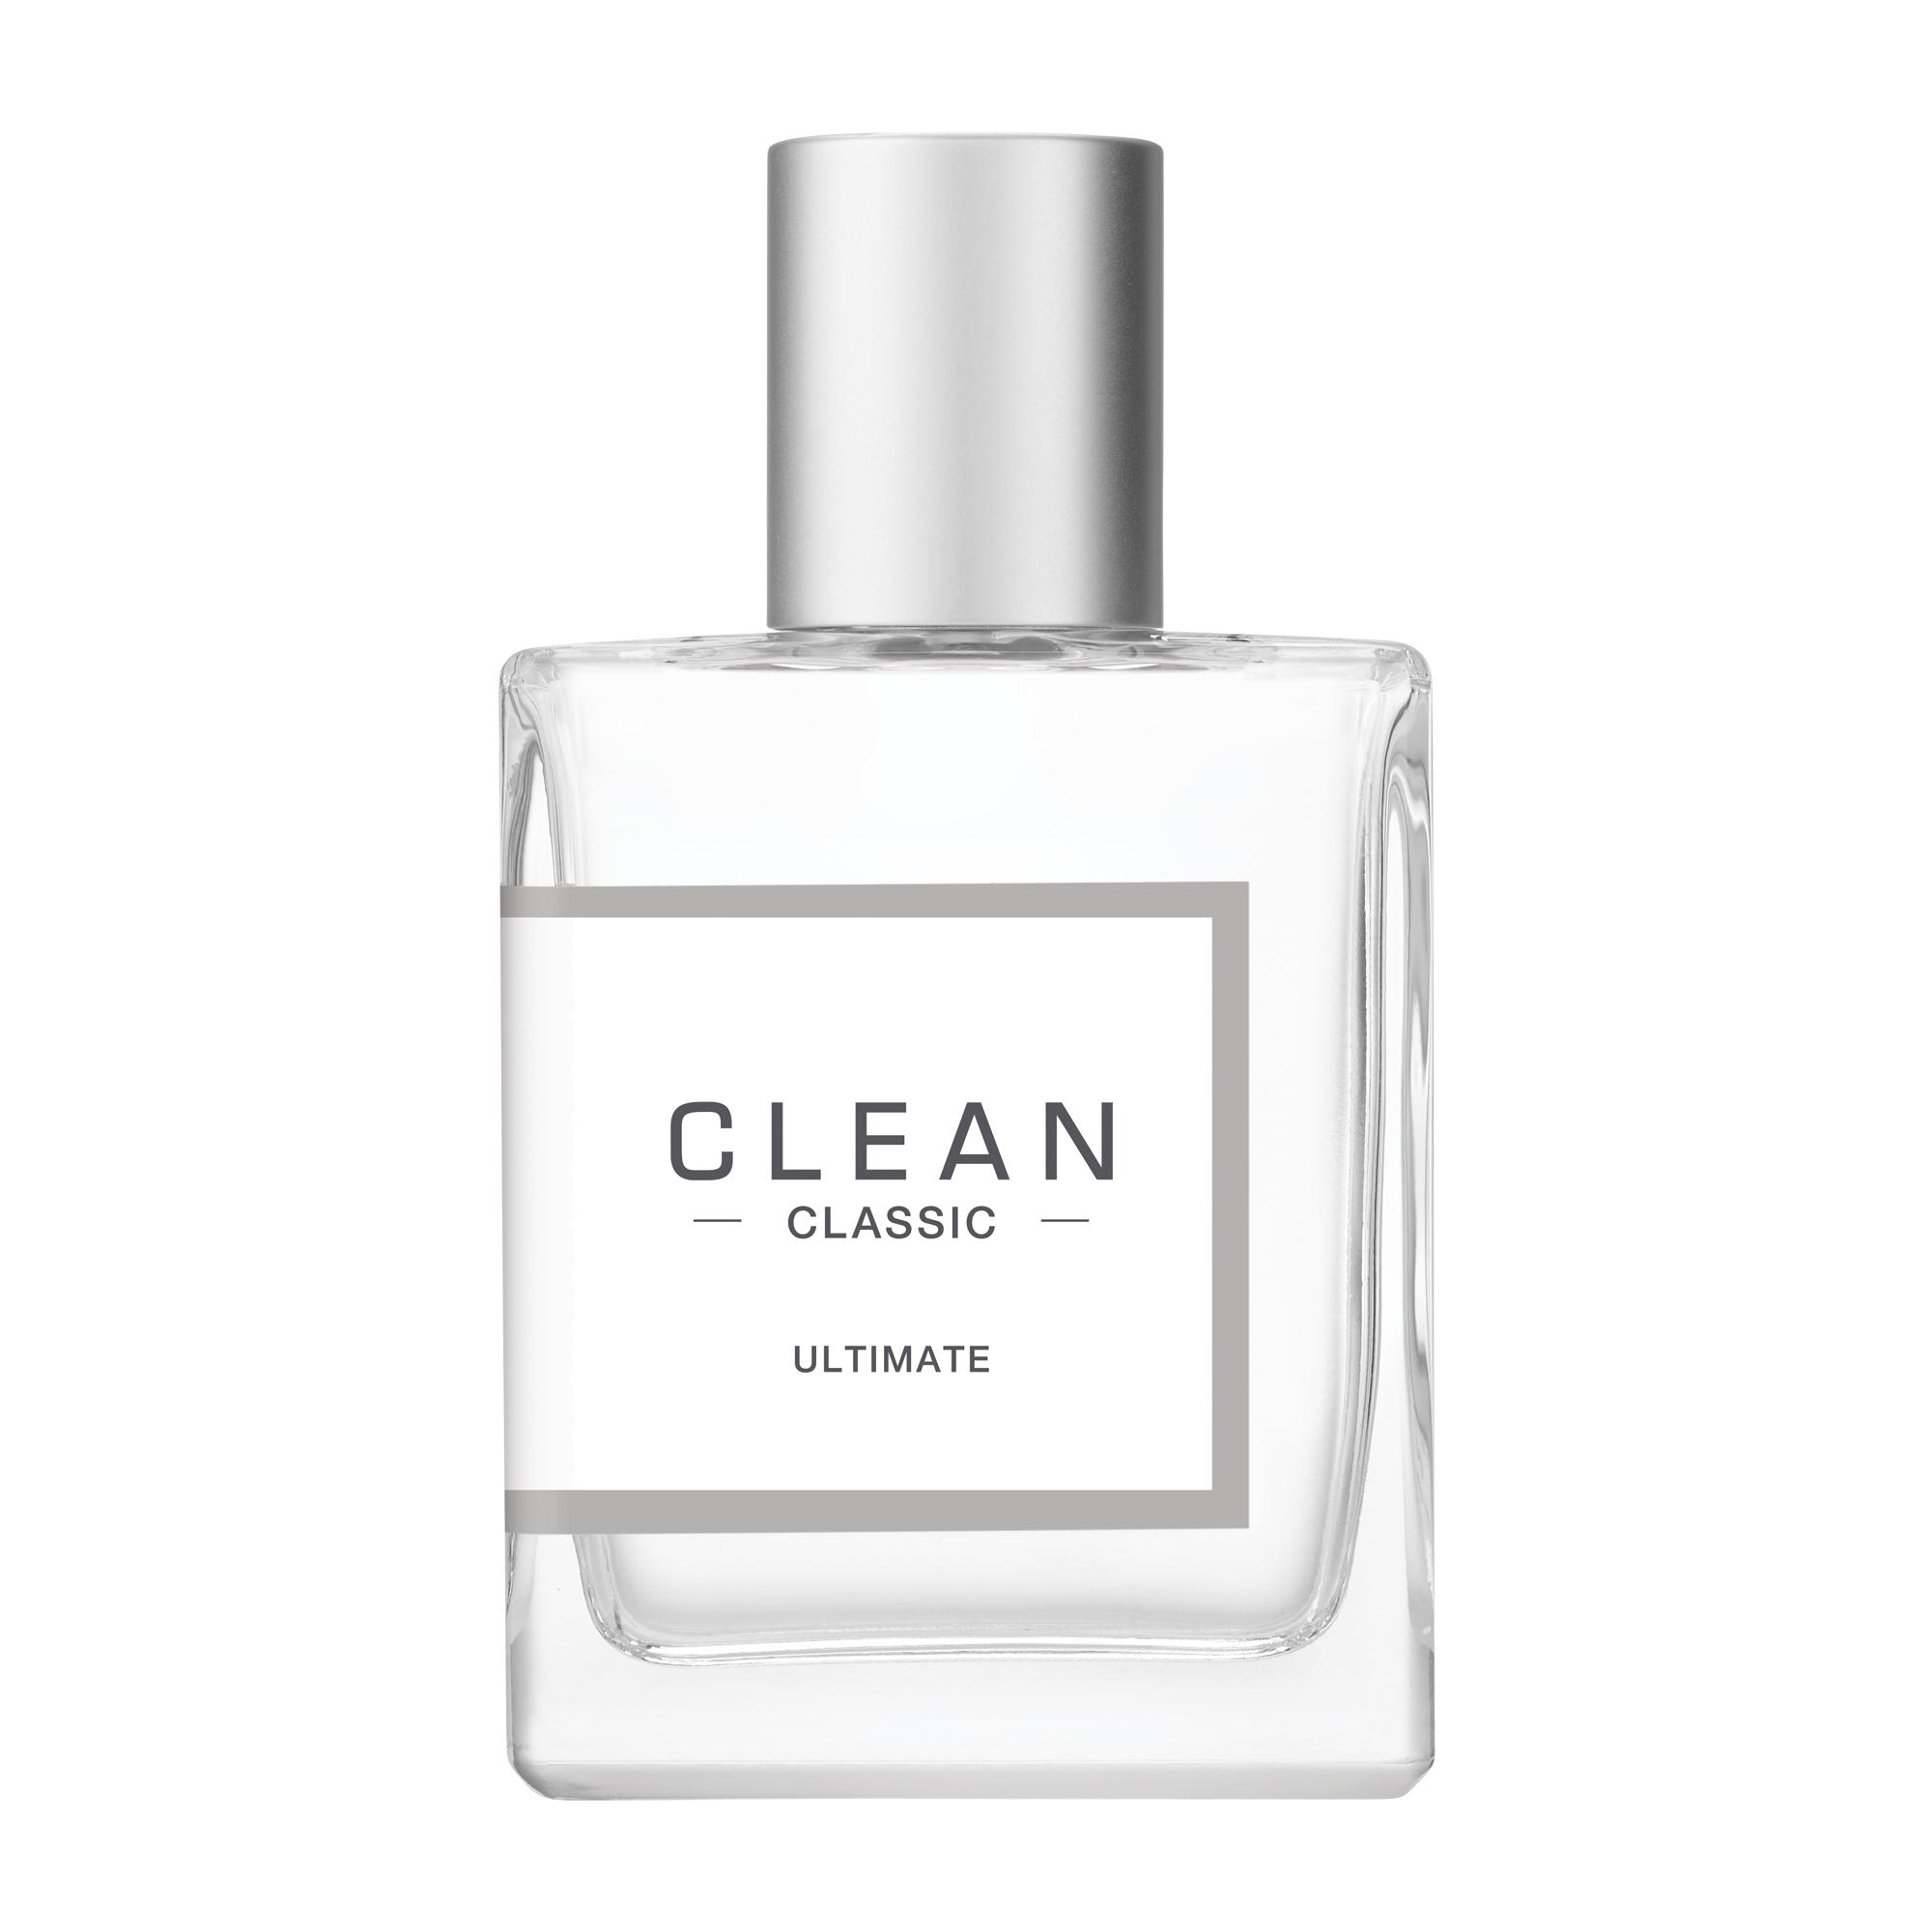 CLEAN Ultimate EDP, 60 ml